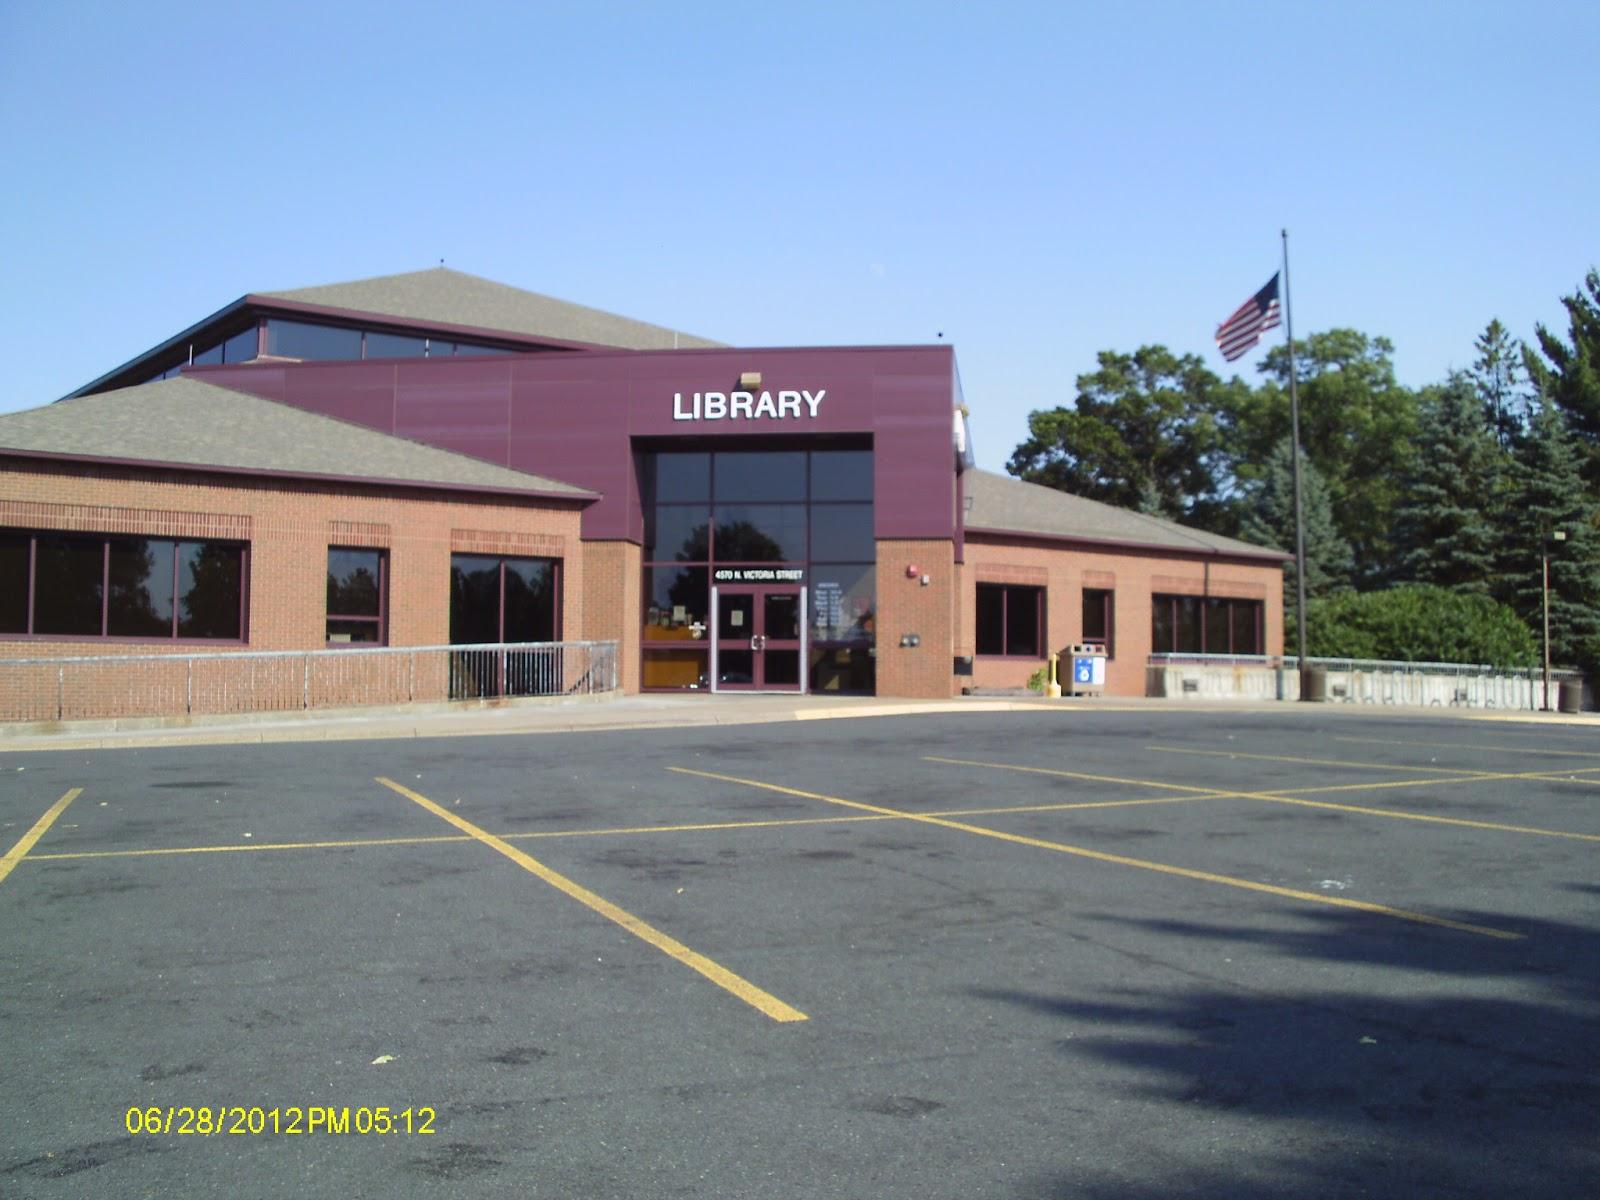 Homework help ramsey county library